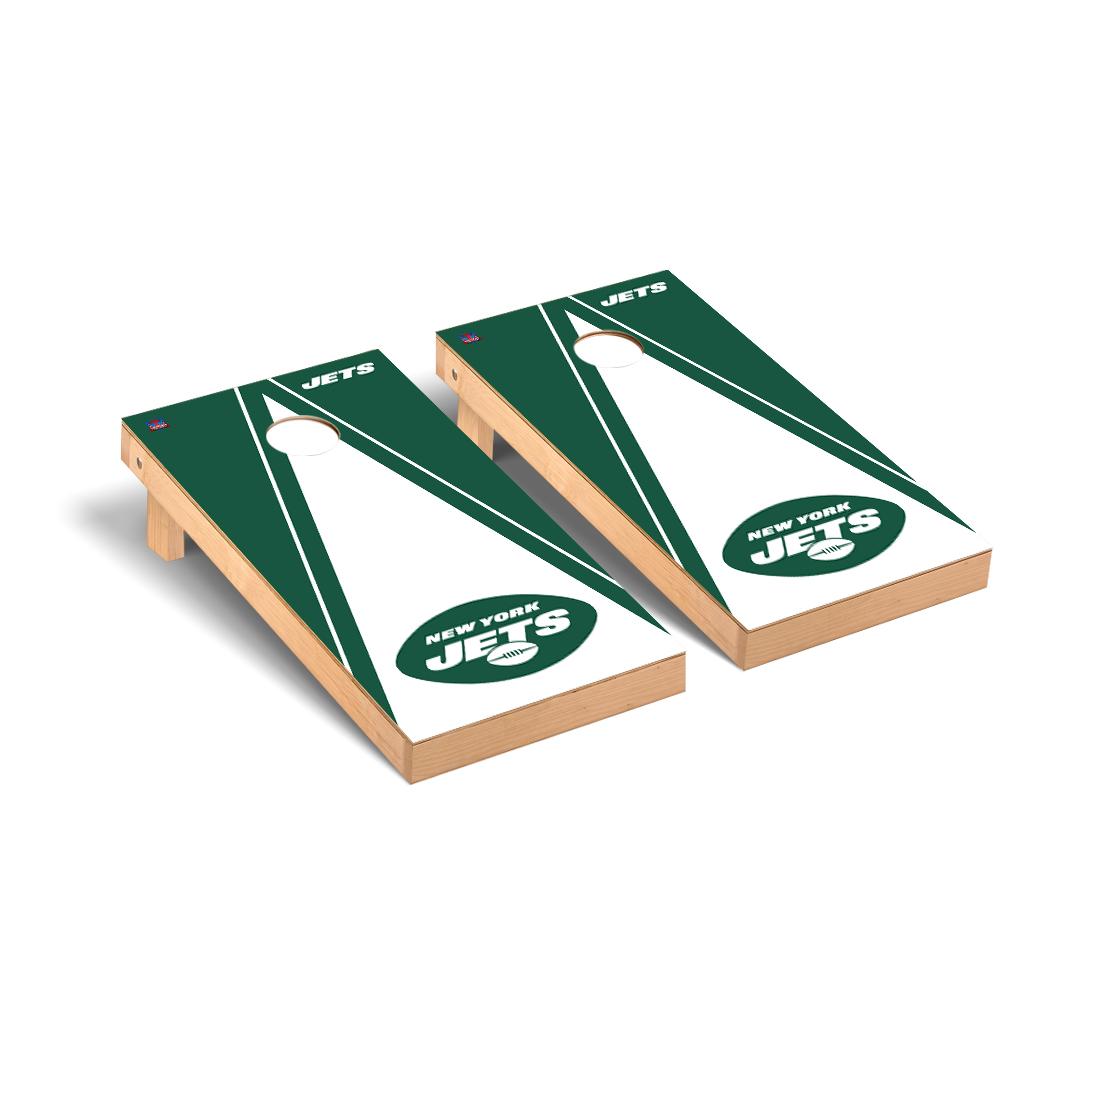 New York Jets NFL Football Cornhole Game Set Triangle Version